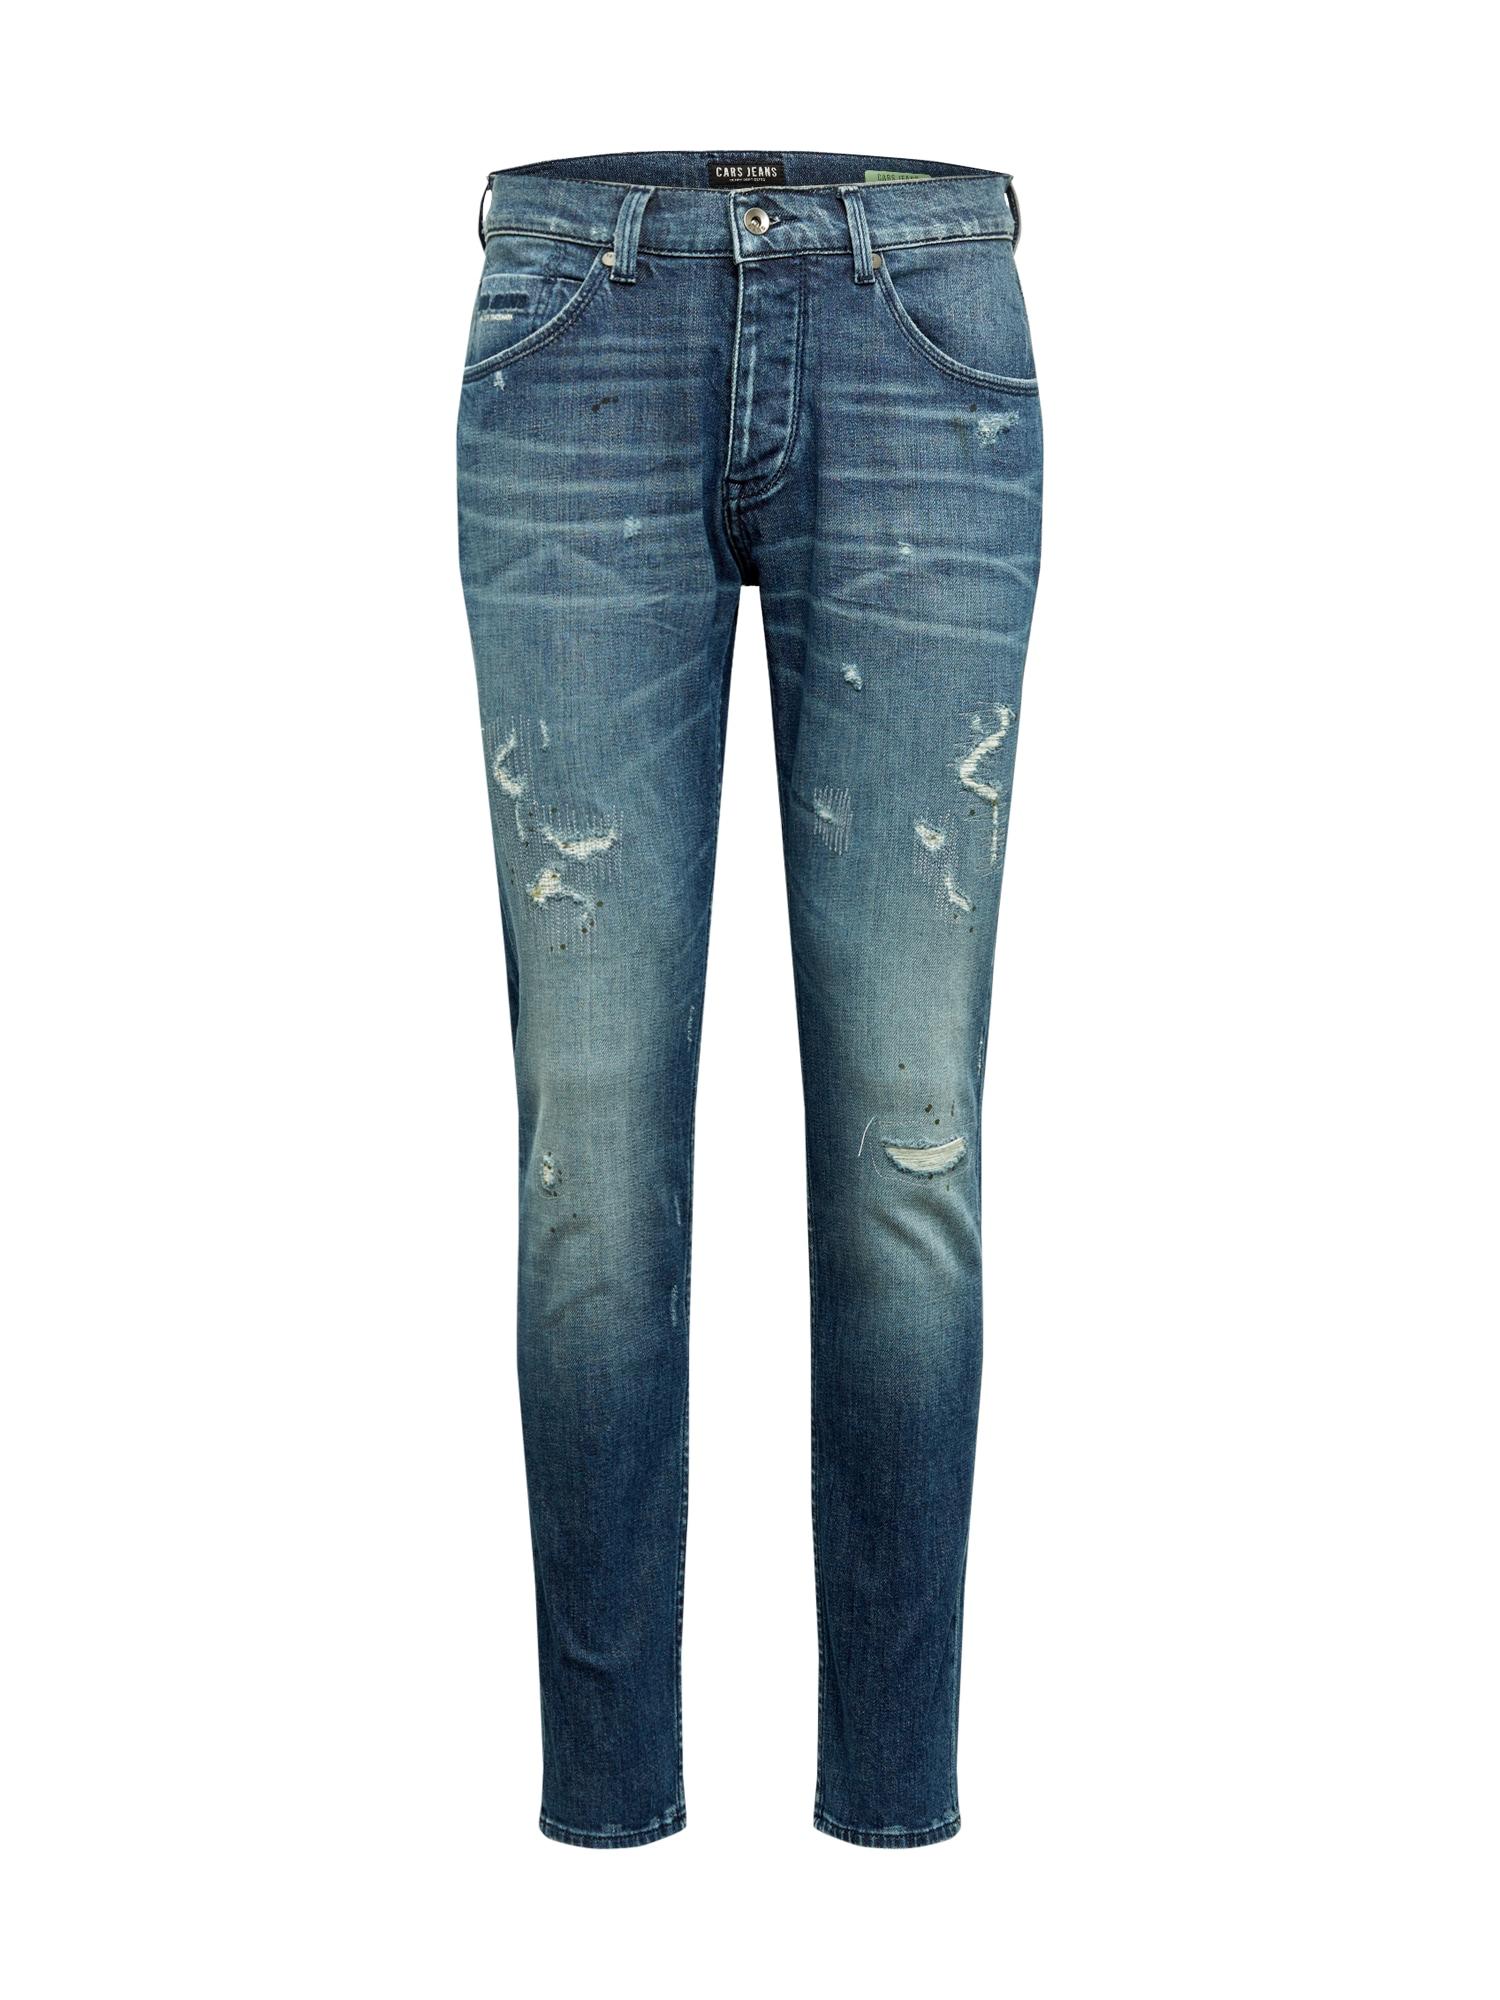 Cars Jeans Džinsai 'CASTLE' tamsiai (džinso) mėlyna